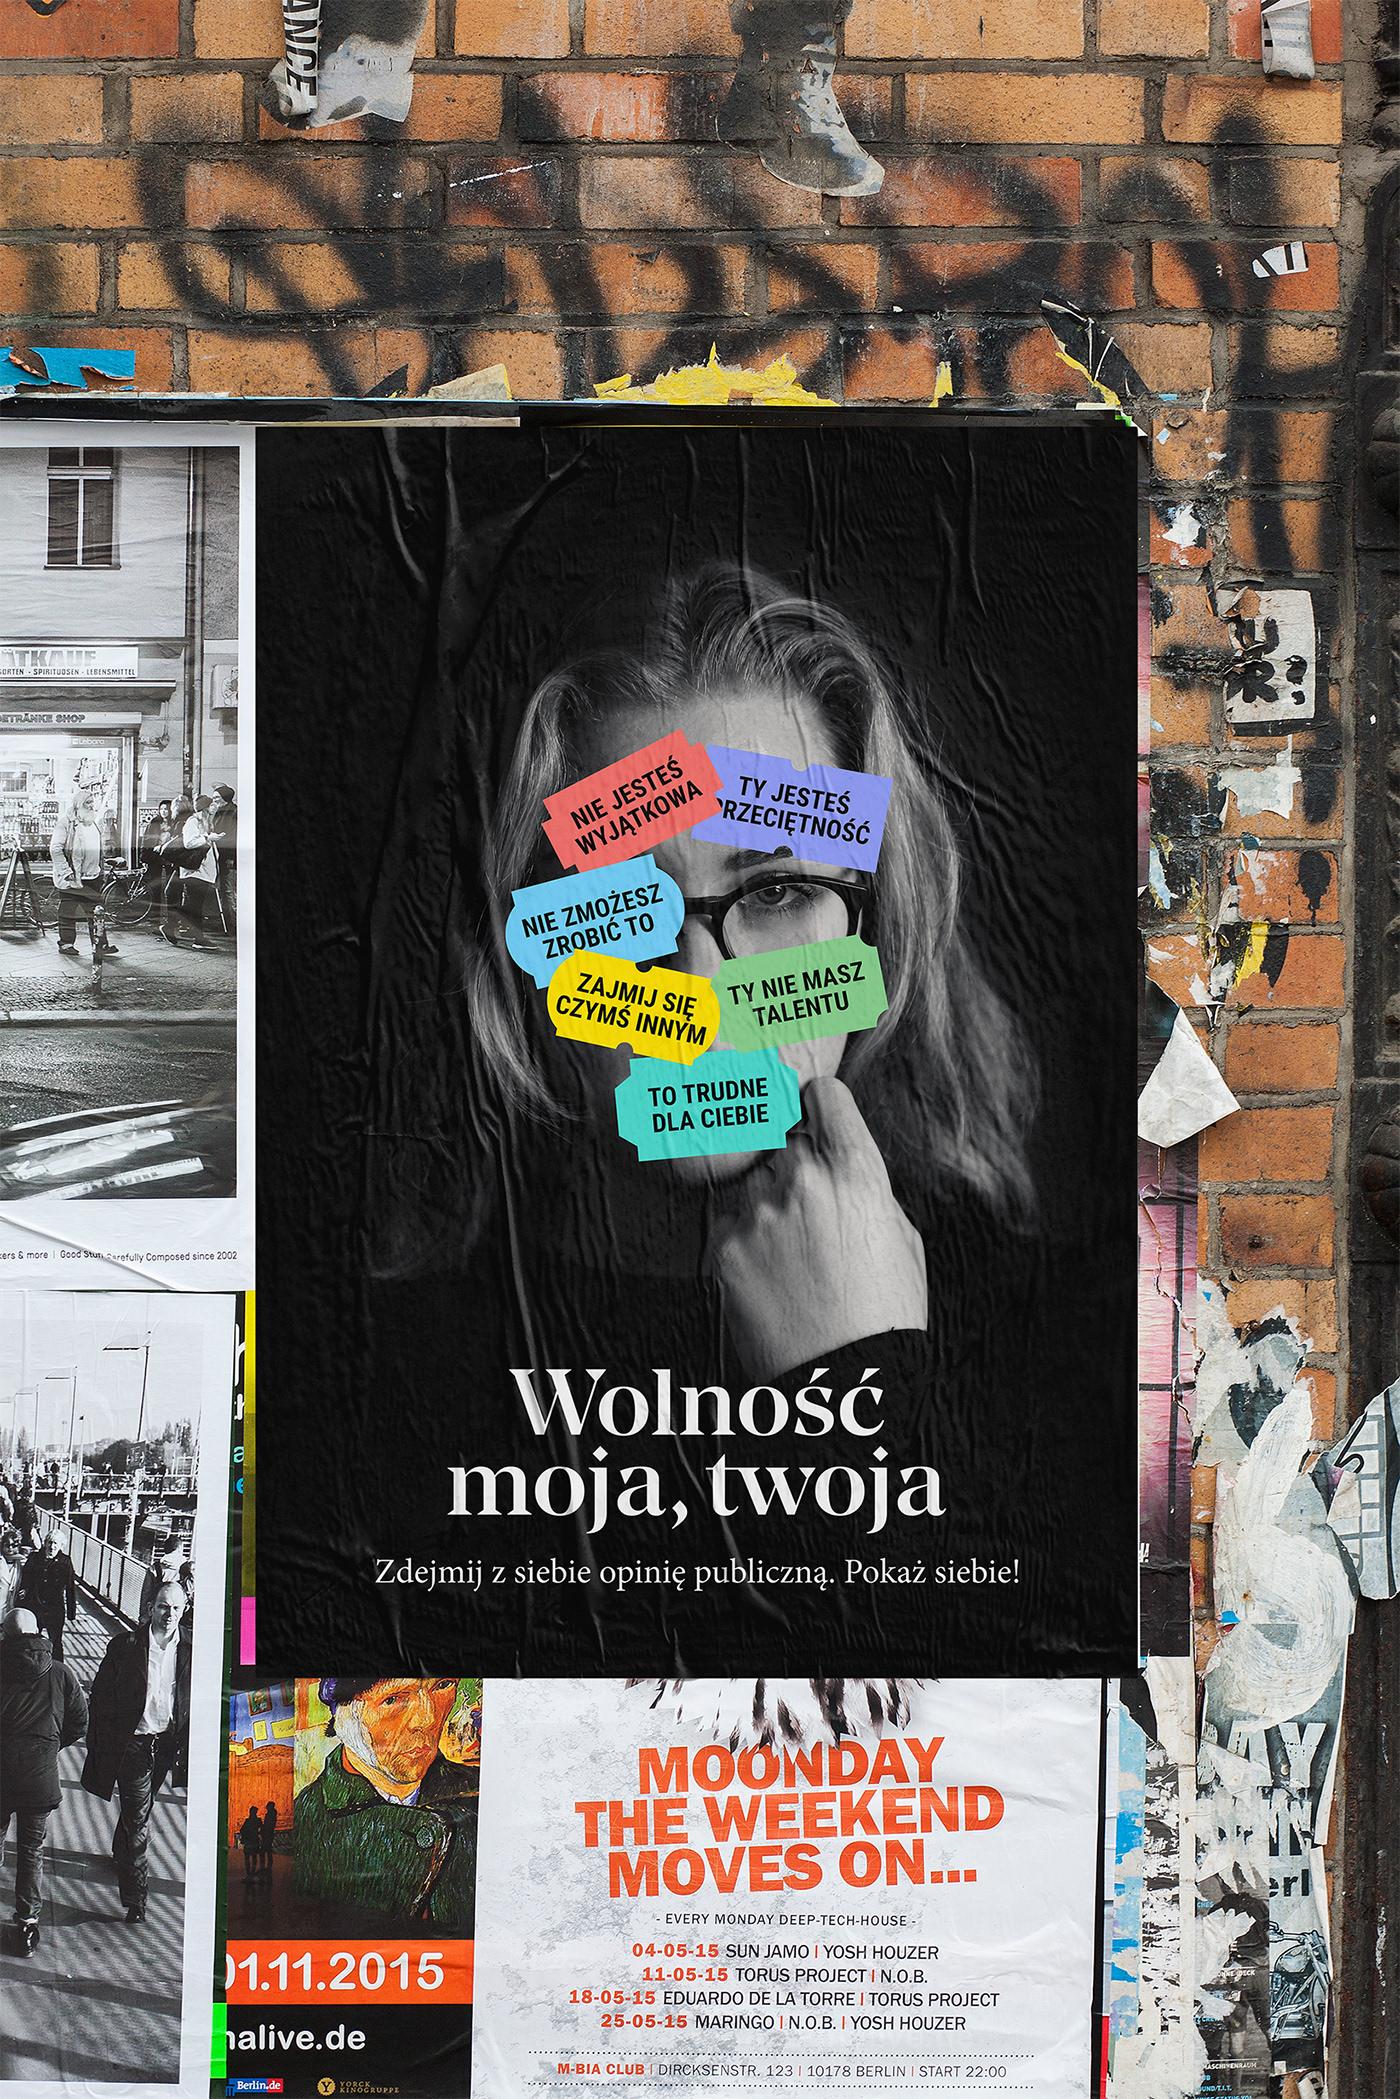 poster social Project photo creative graphic design Performance portrait face